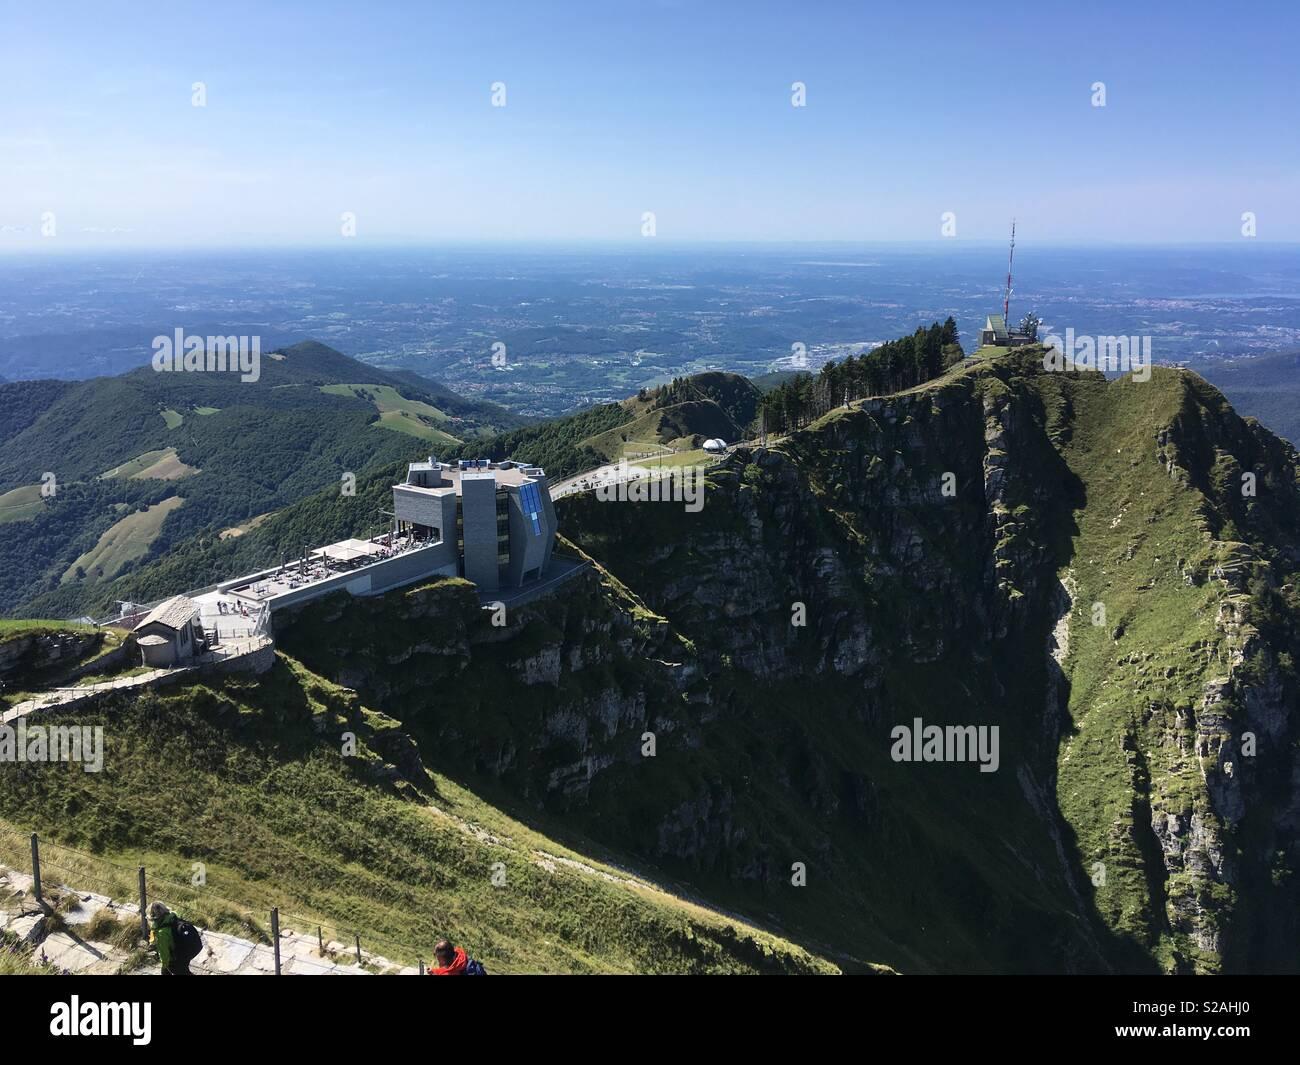 Le Monte Generoso, Suisse: panorama depuis le haut et vue sur la Pietra di Fiore Photo Stock